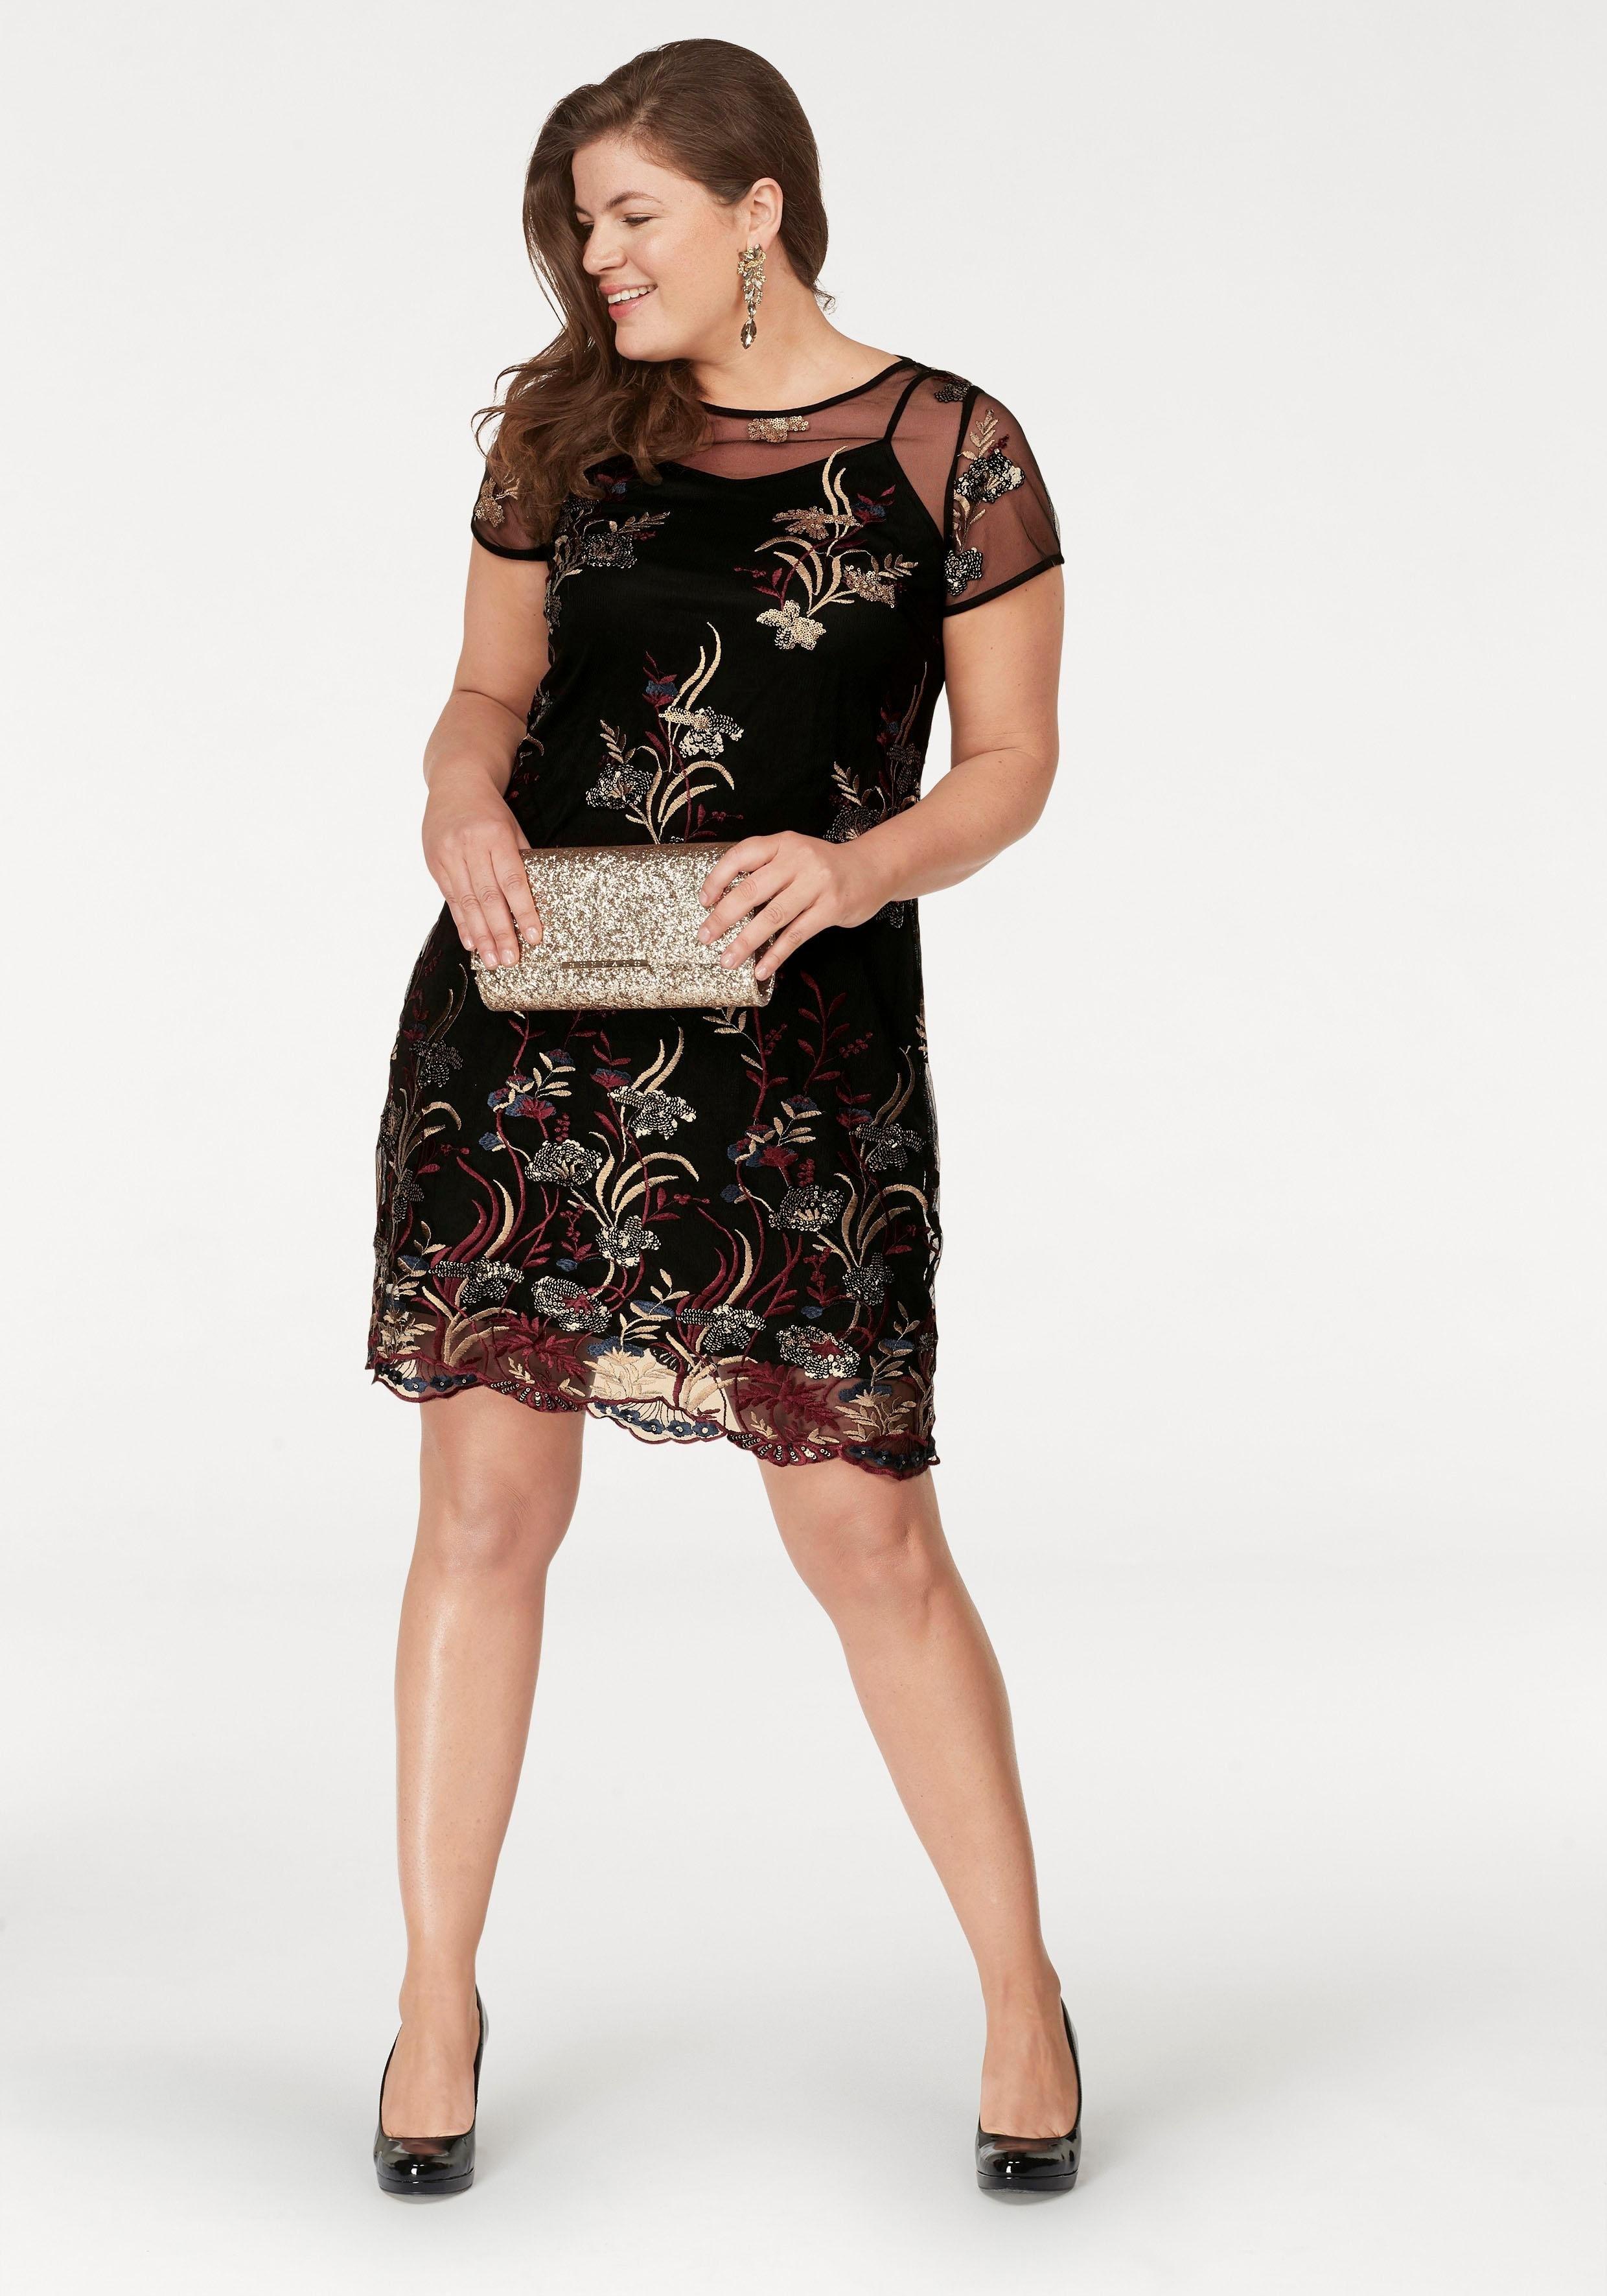 727b20d62cedb9 Paprika jurk met pailletten online bij